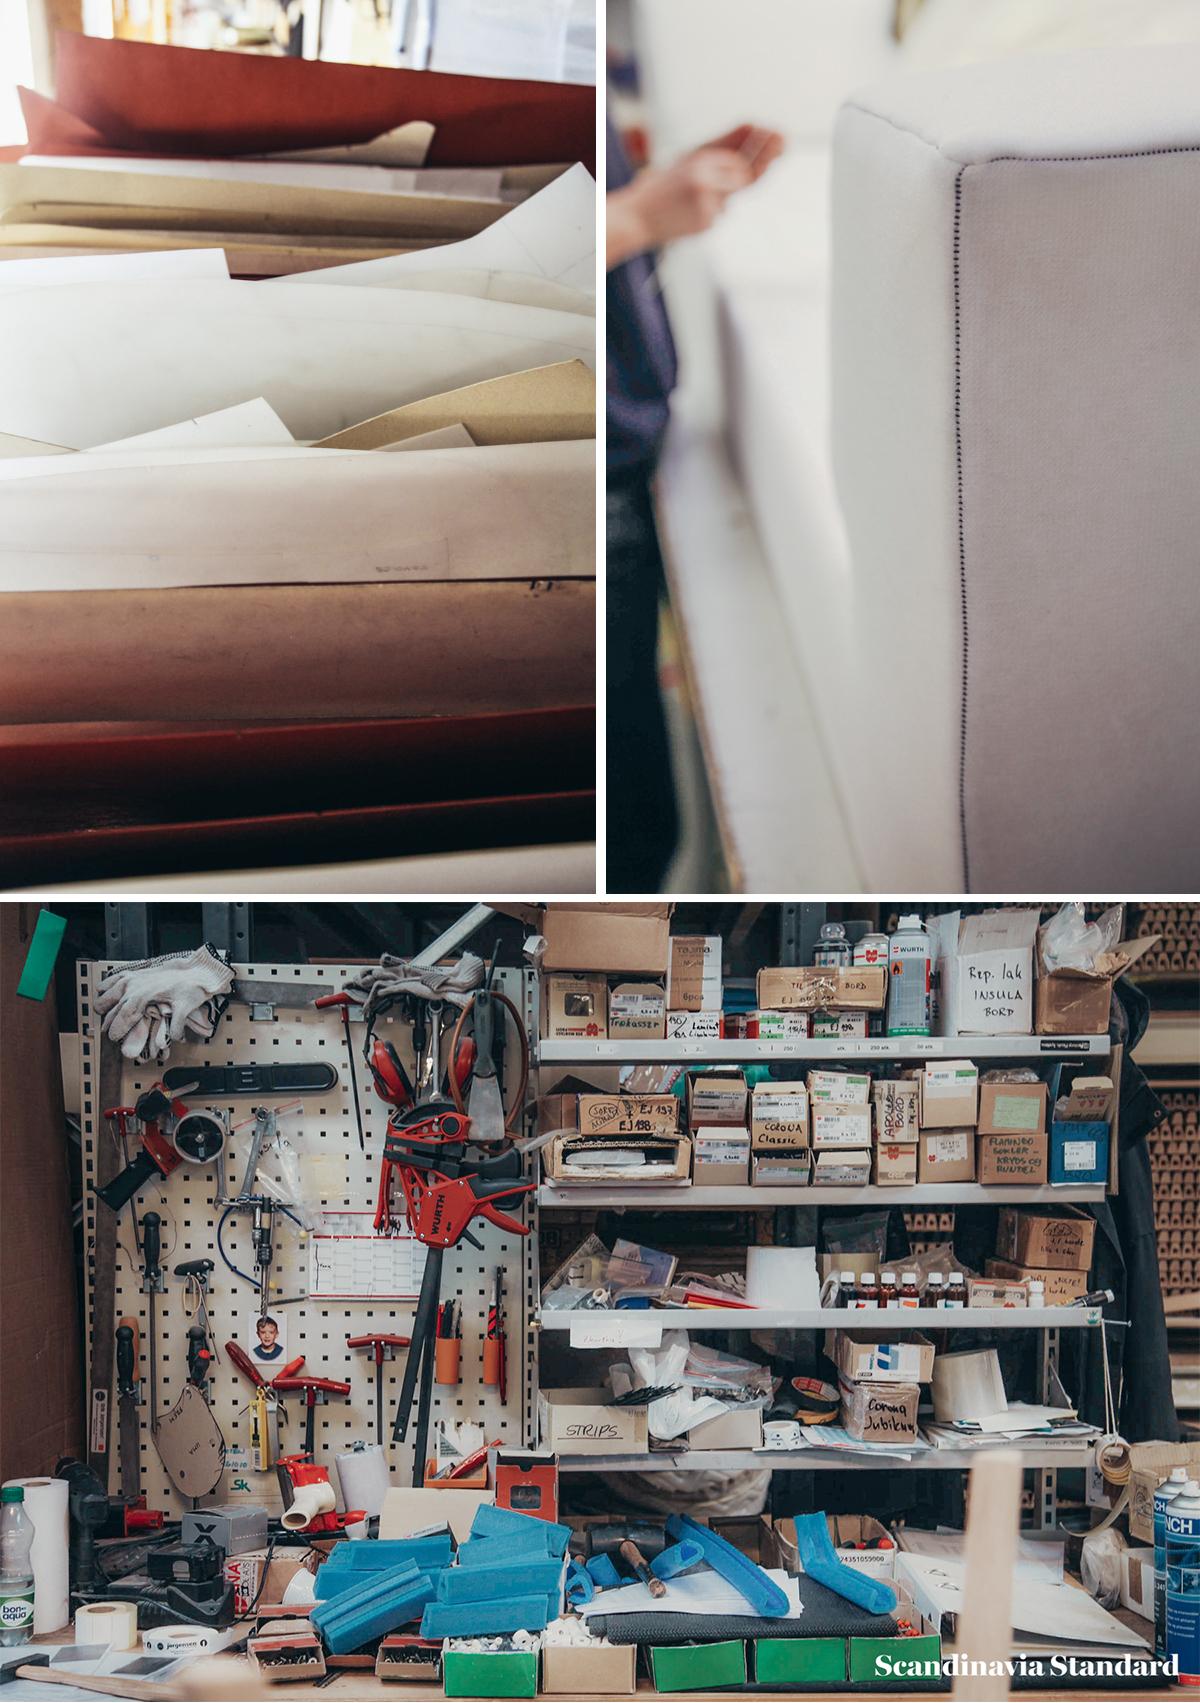 Danish Design Sofa Delphi Making of | Scandinavia Standard